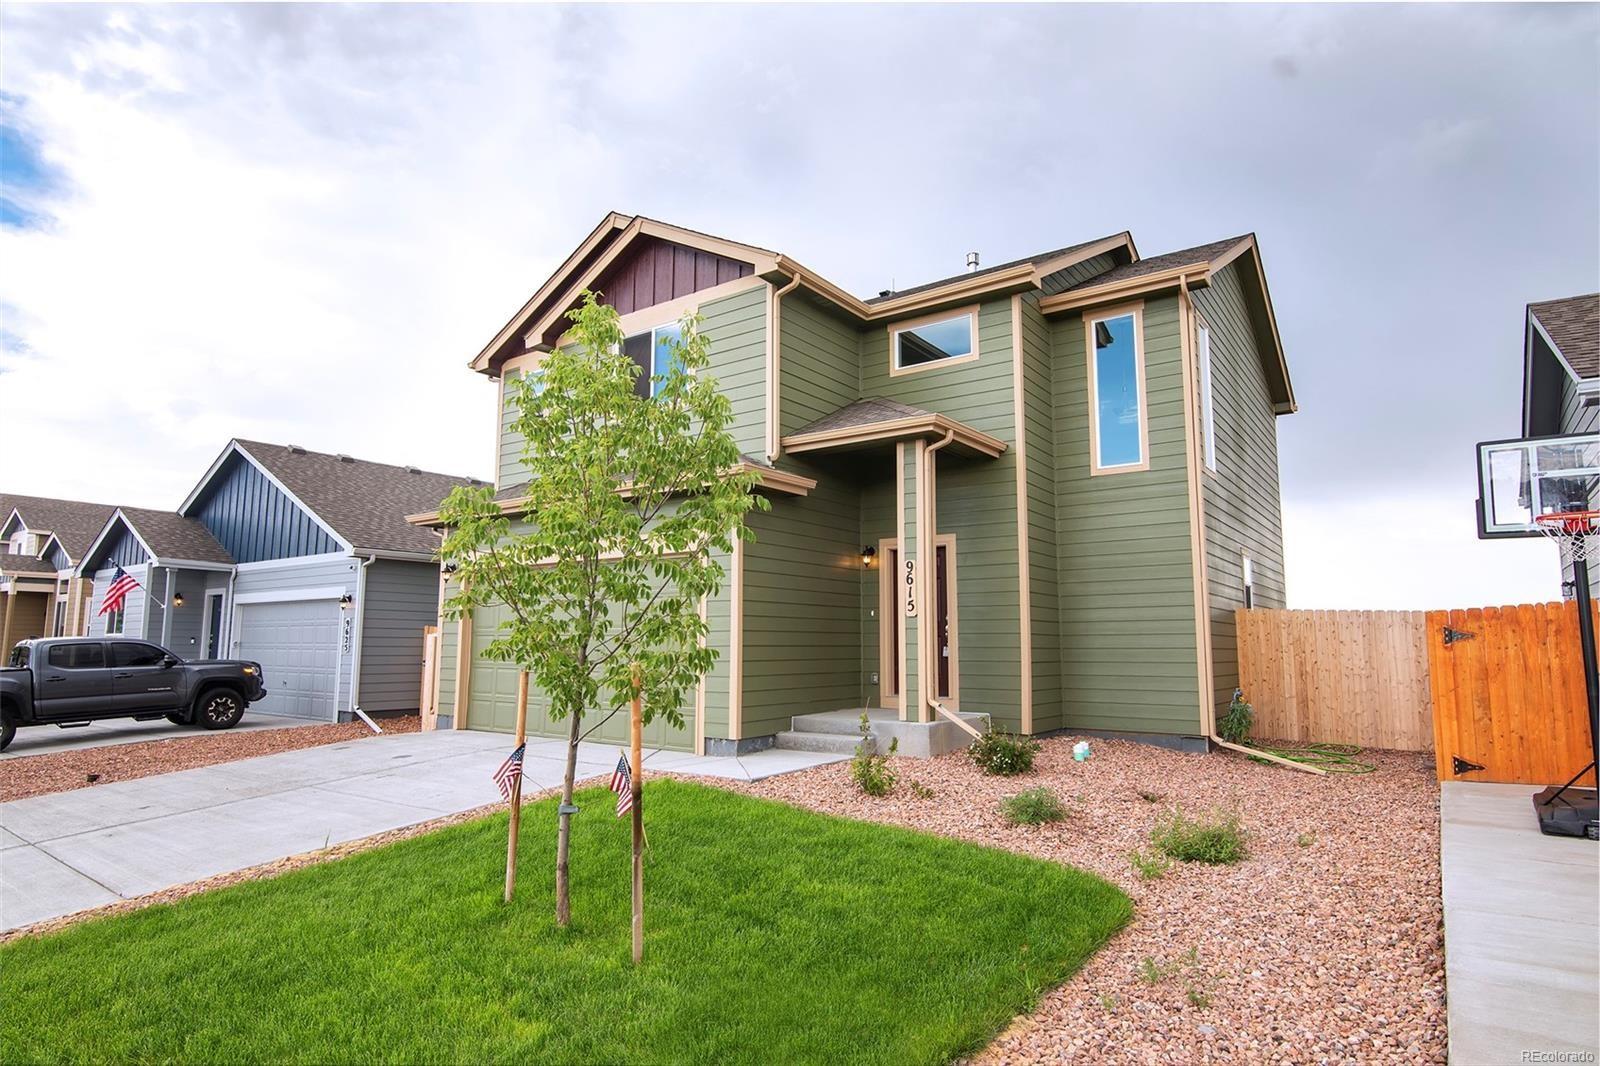 MLS# 7058019 - 3 - 9615 Rubicon Drive, Colorado Springs, CO 80925